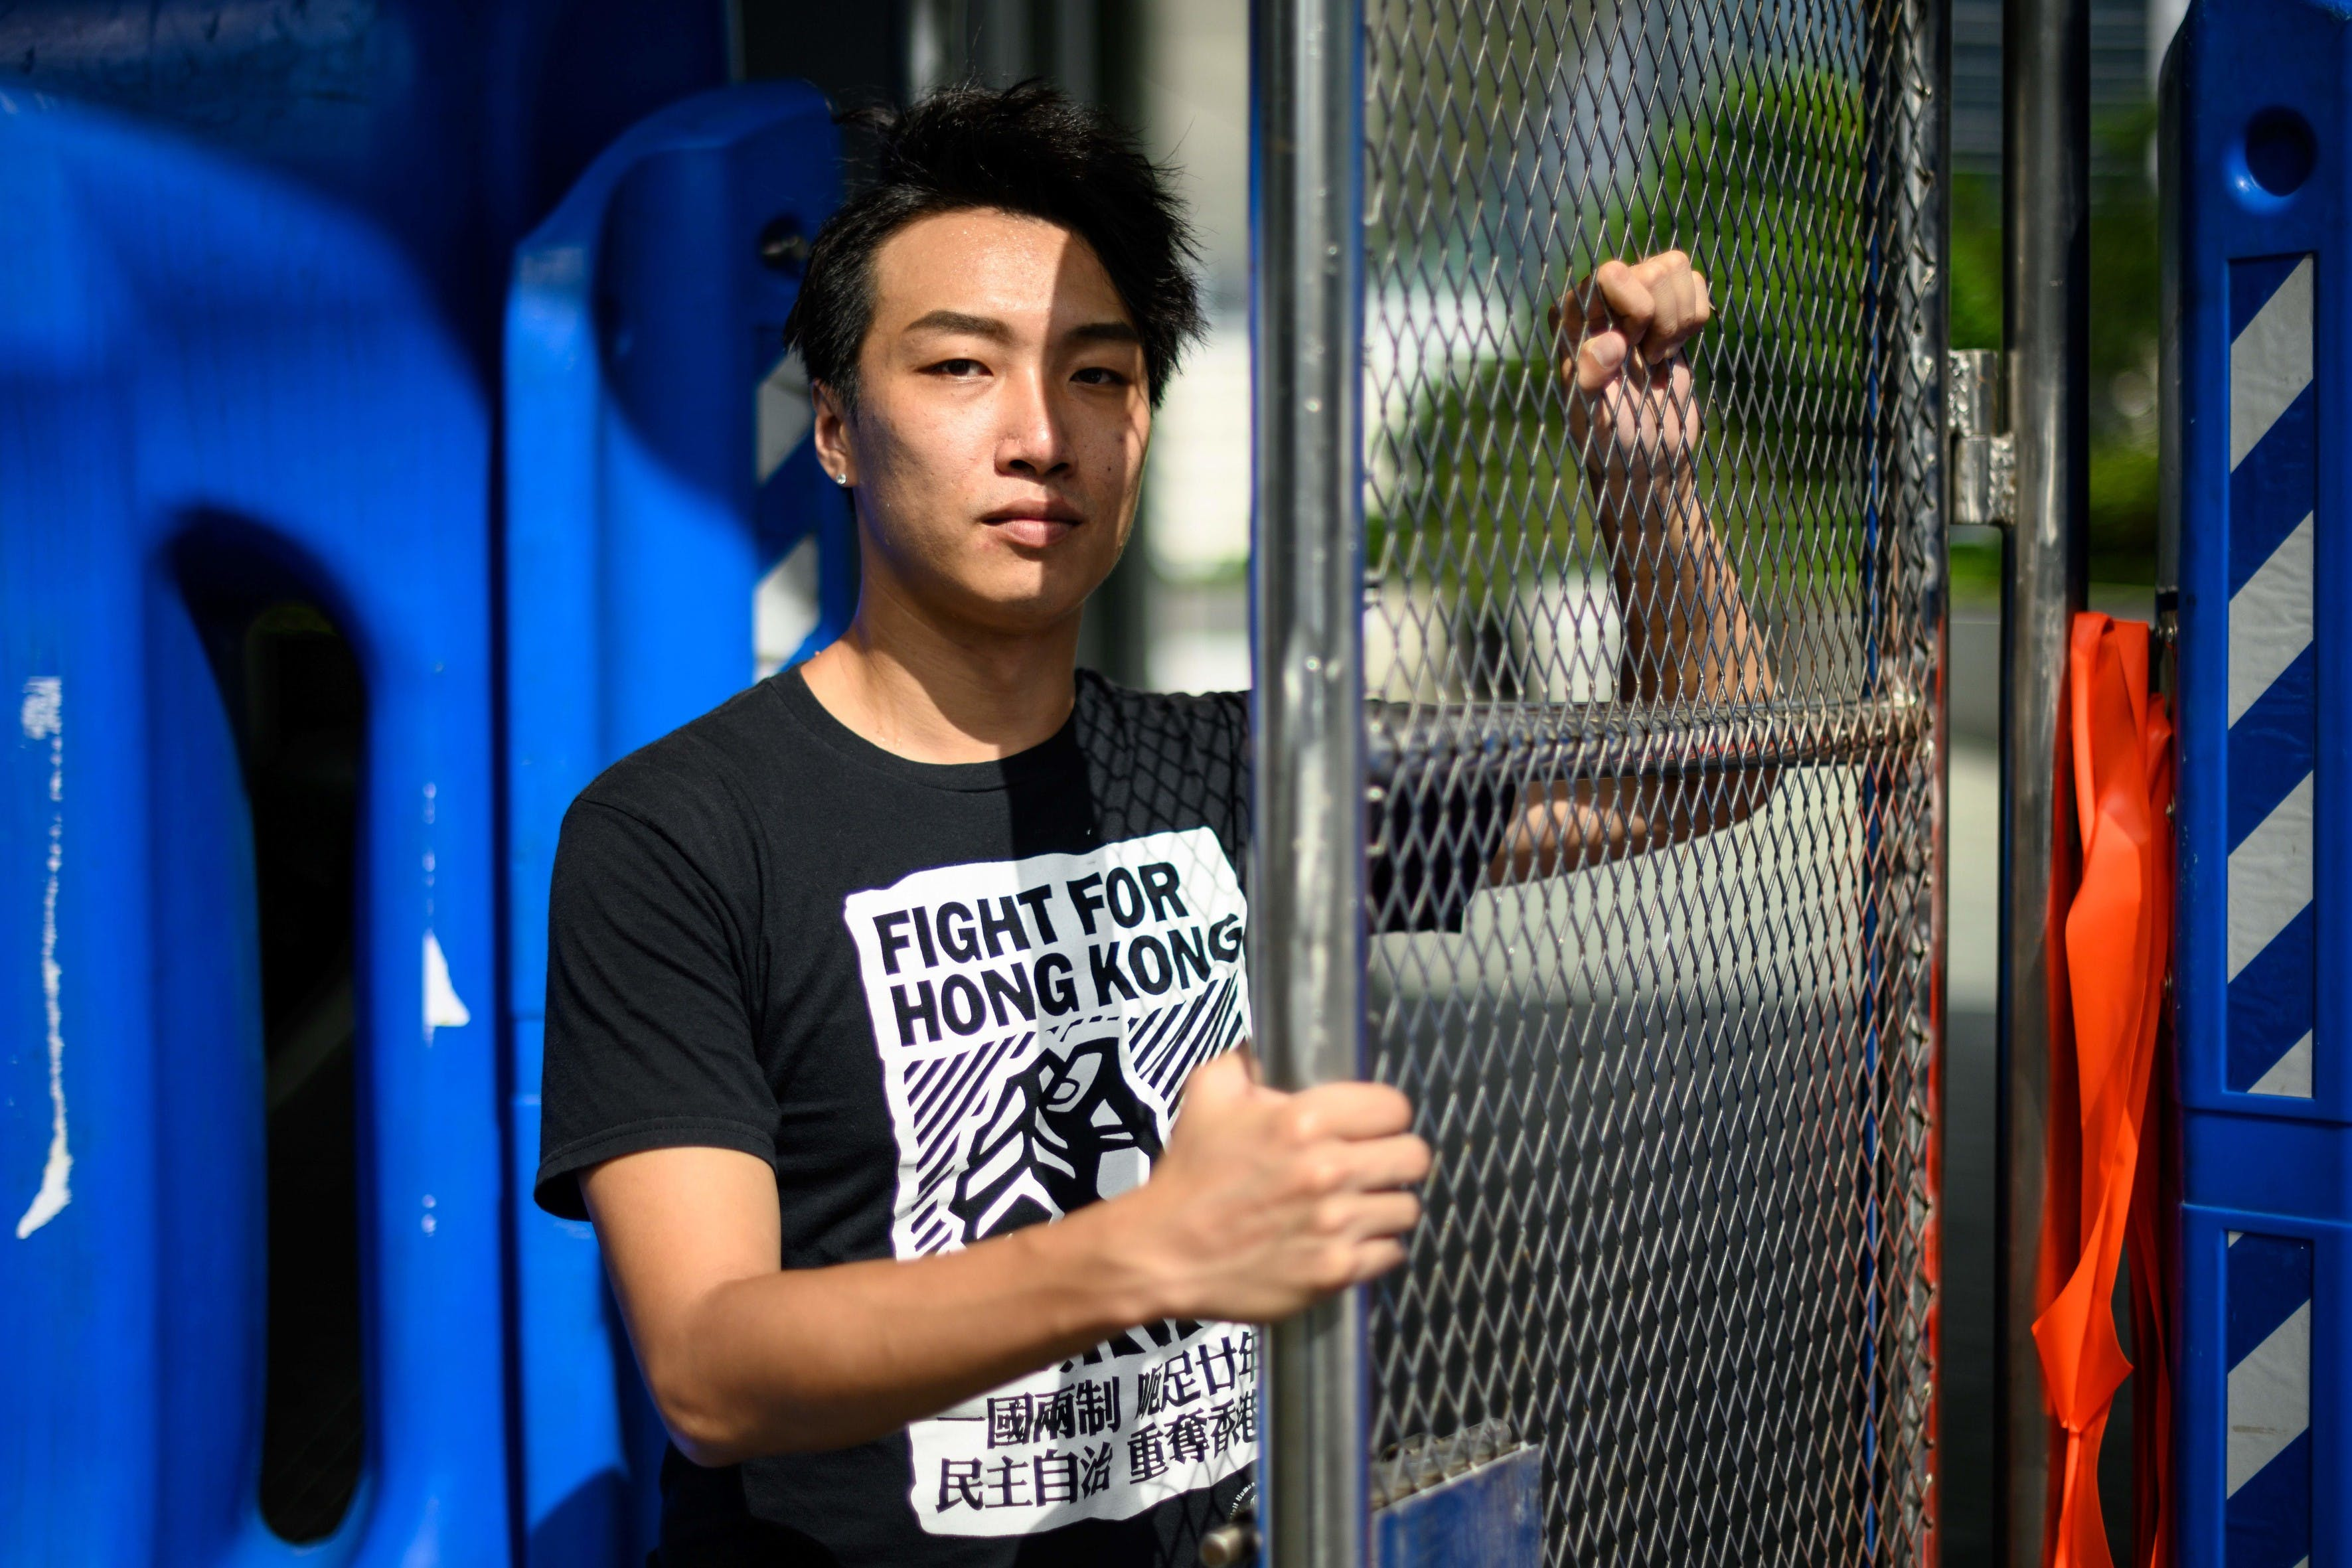 Un manifestant à Hong Kong © ANTHONY WALLACE/AFP/Getty Images